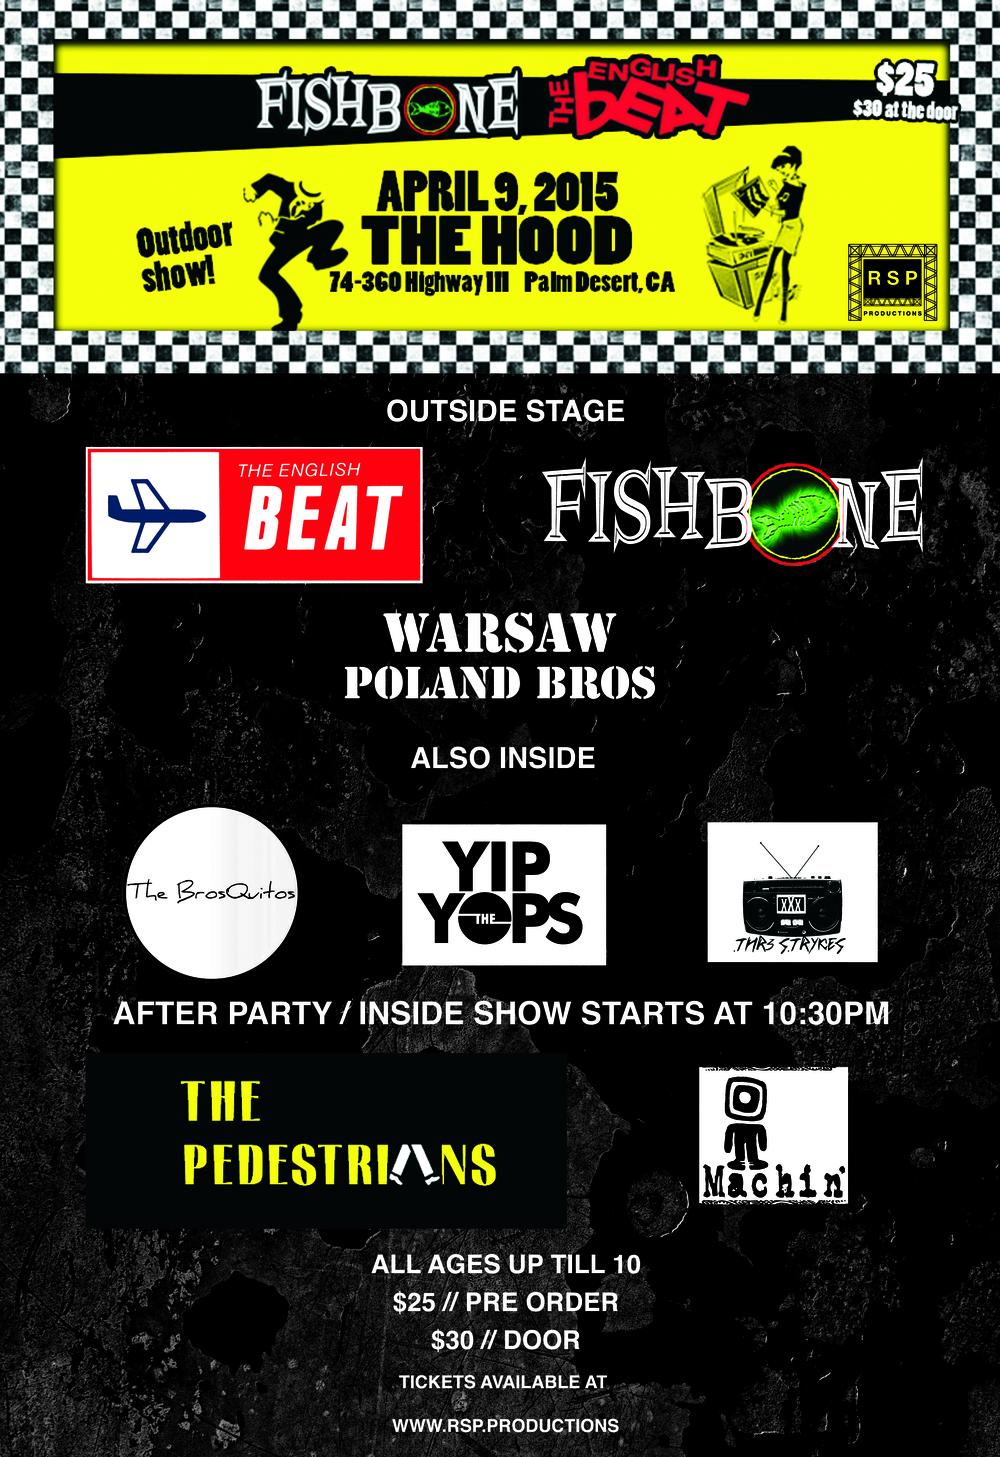 The English Beat Fishbone Poster.jpg